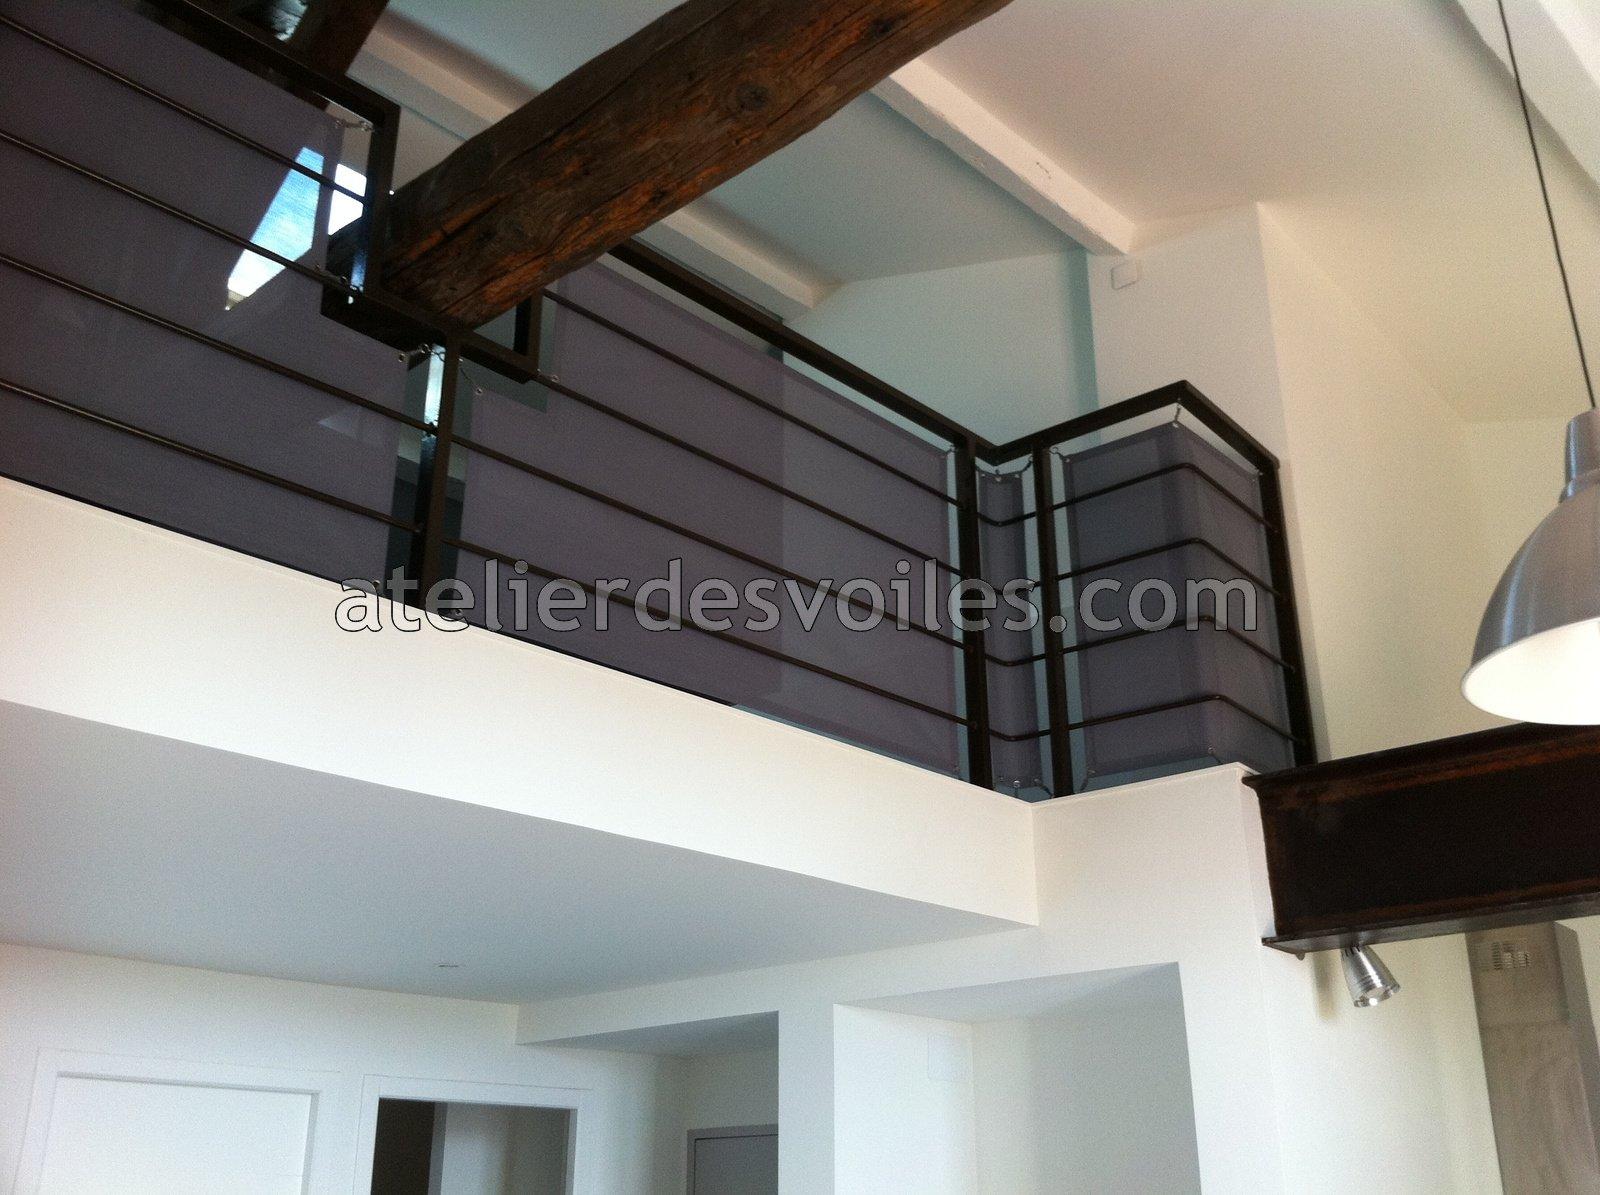 pergola brise vue 04 atelier des voiles. Black Bedroom Furniture Sets. Home Design Ideas